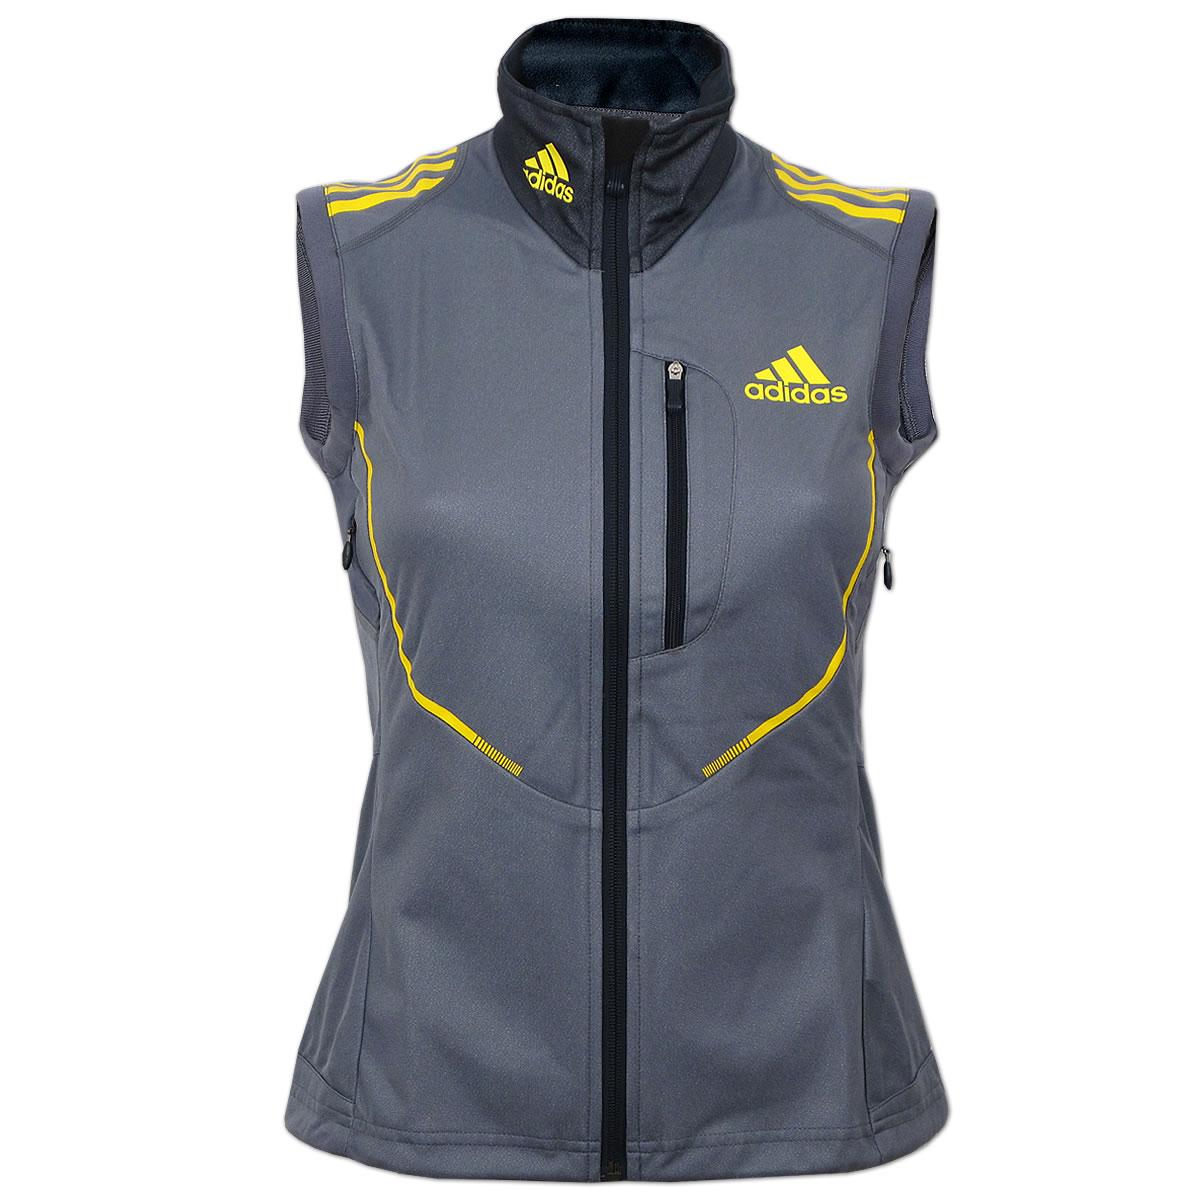 753339002d49 adidas Damen Athleten Weste Gore Windstopper Running Laufweste Langlauf  Sport